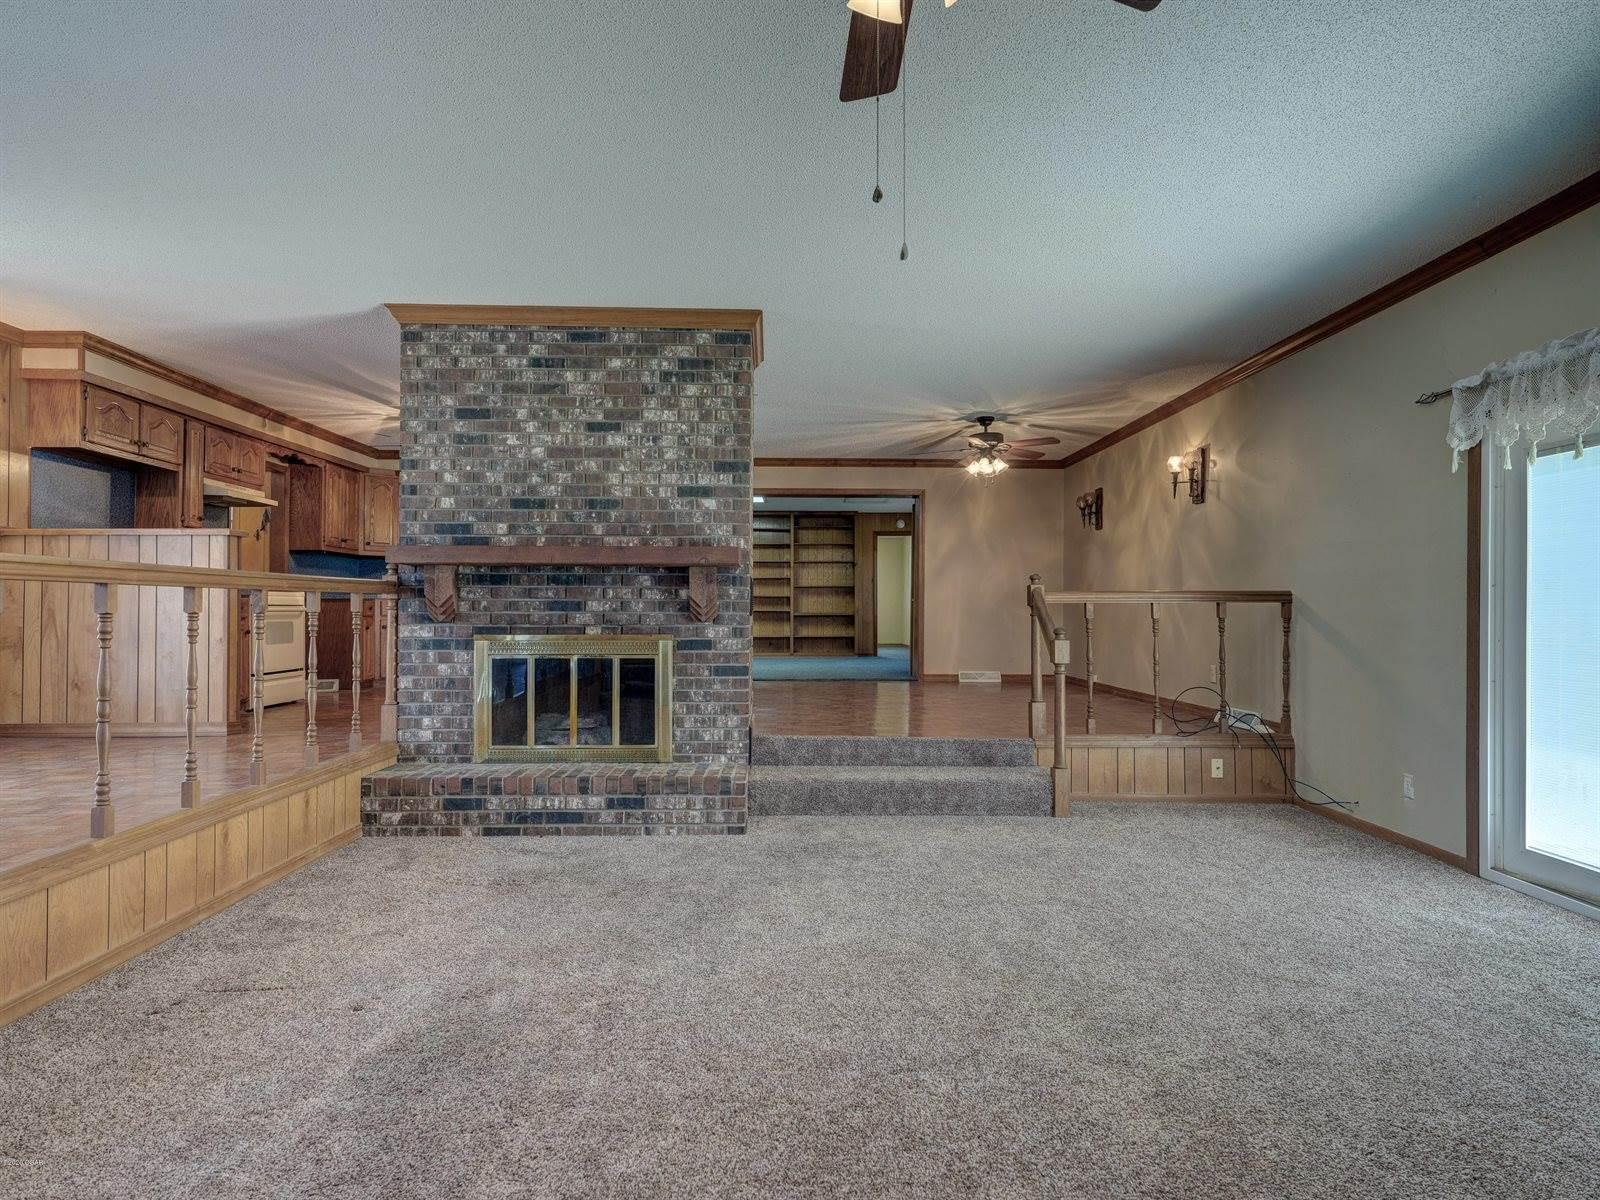 100 West Mercer Street, Jasper, MO 64755